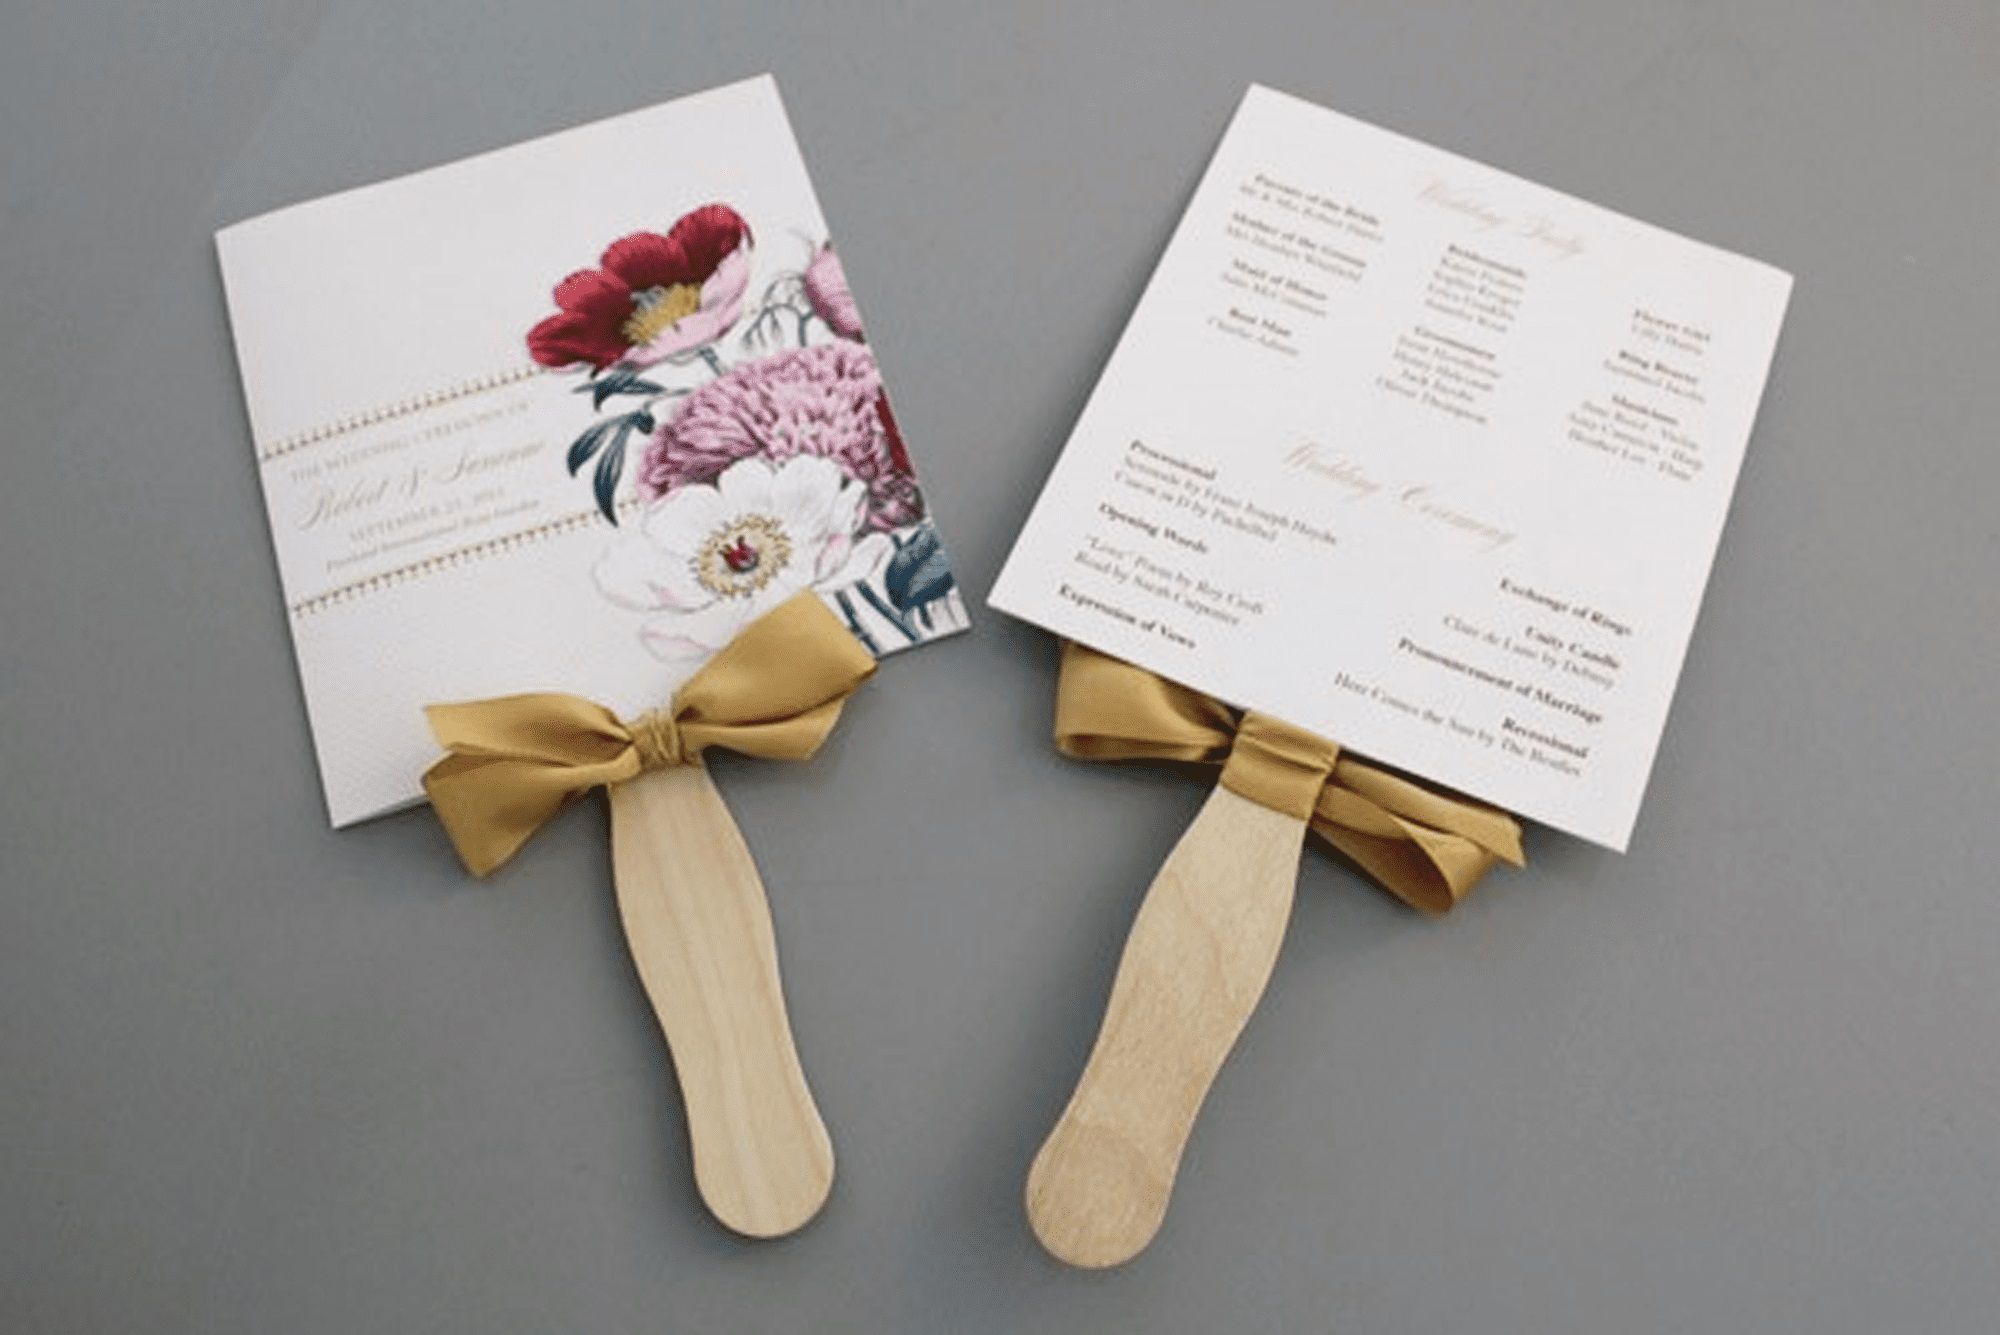 009 Marvelou Free Wedding Program Fan Template High Def  Templates Printable Paddle WordFull